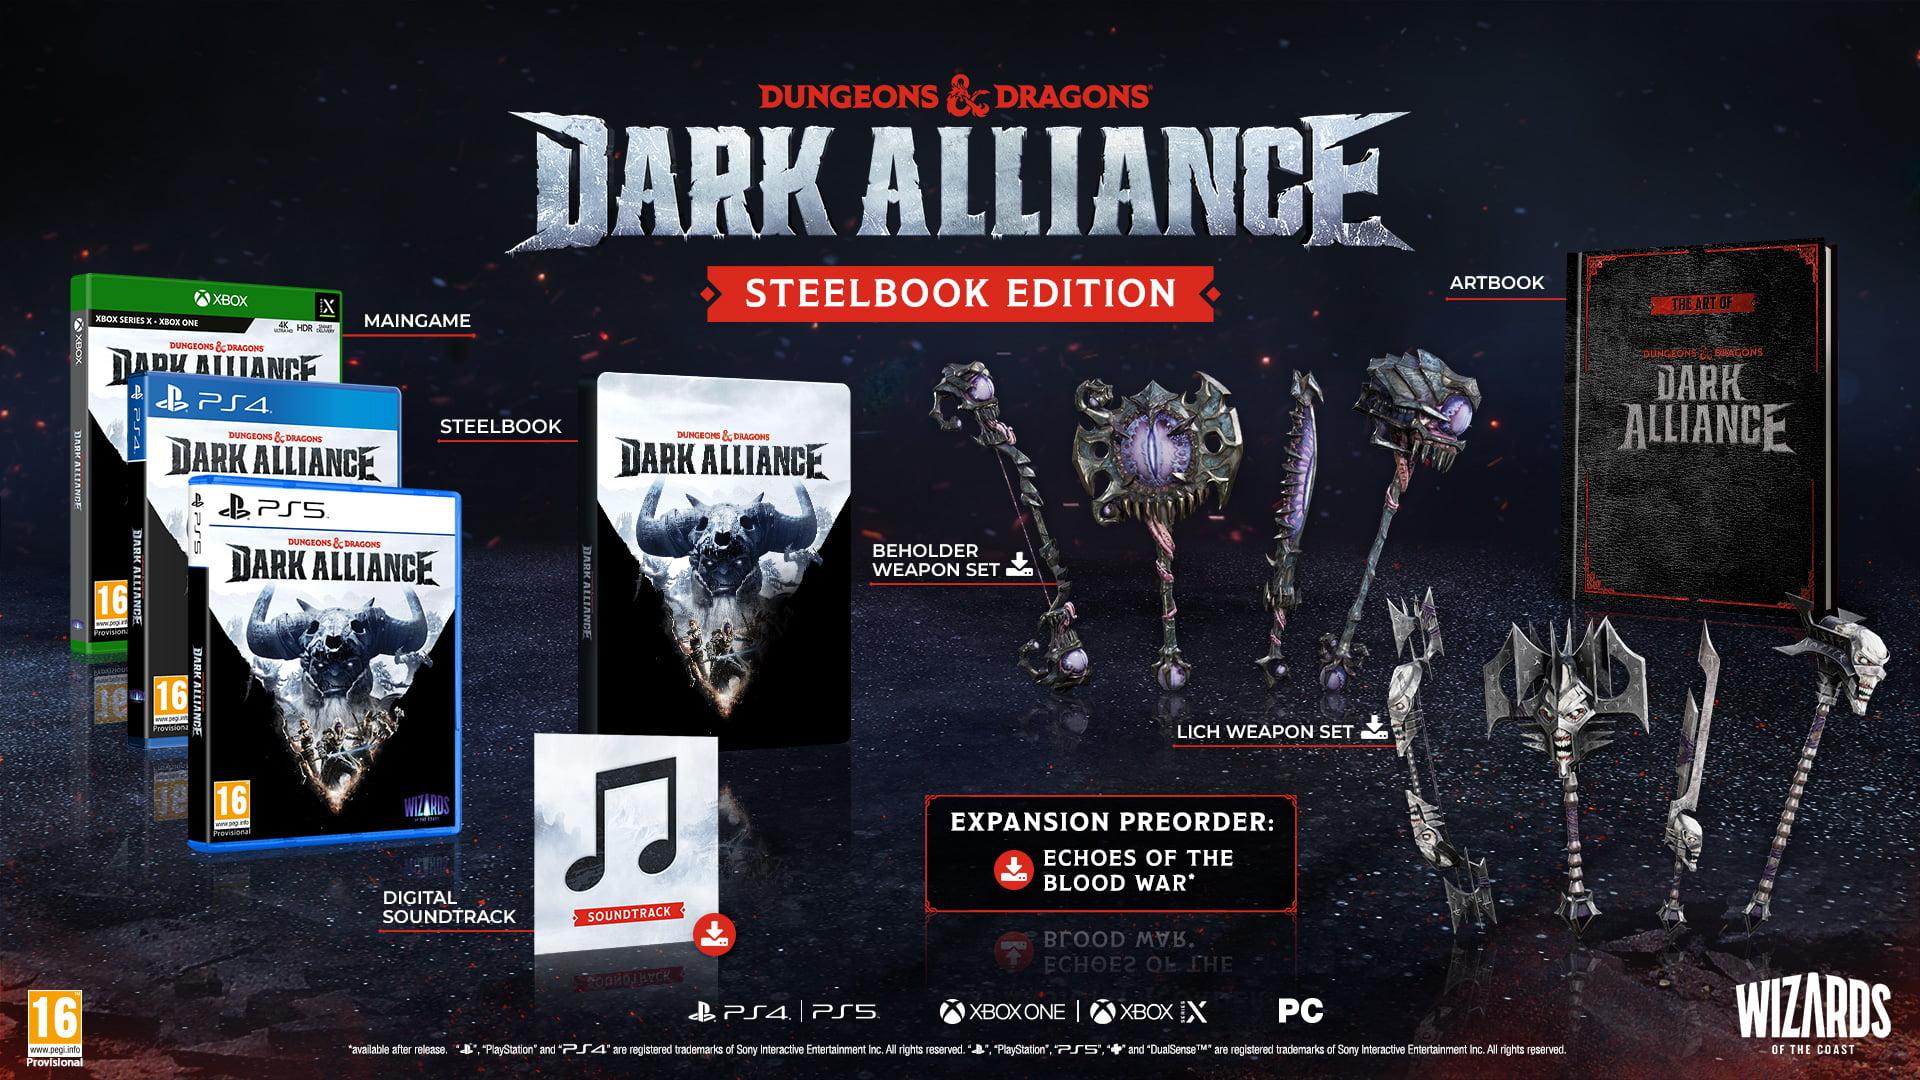 Dungeons and Dragons: Dark Alliance - Steelbook Edition (PS4)